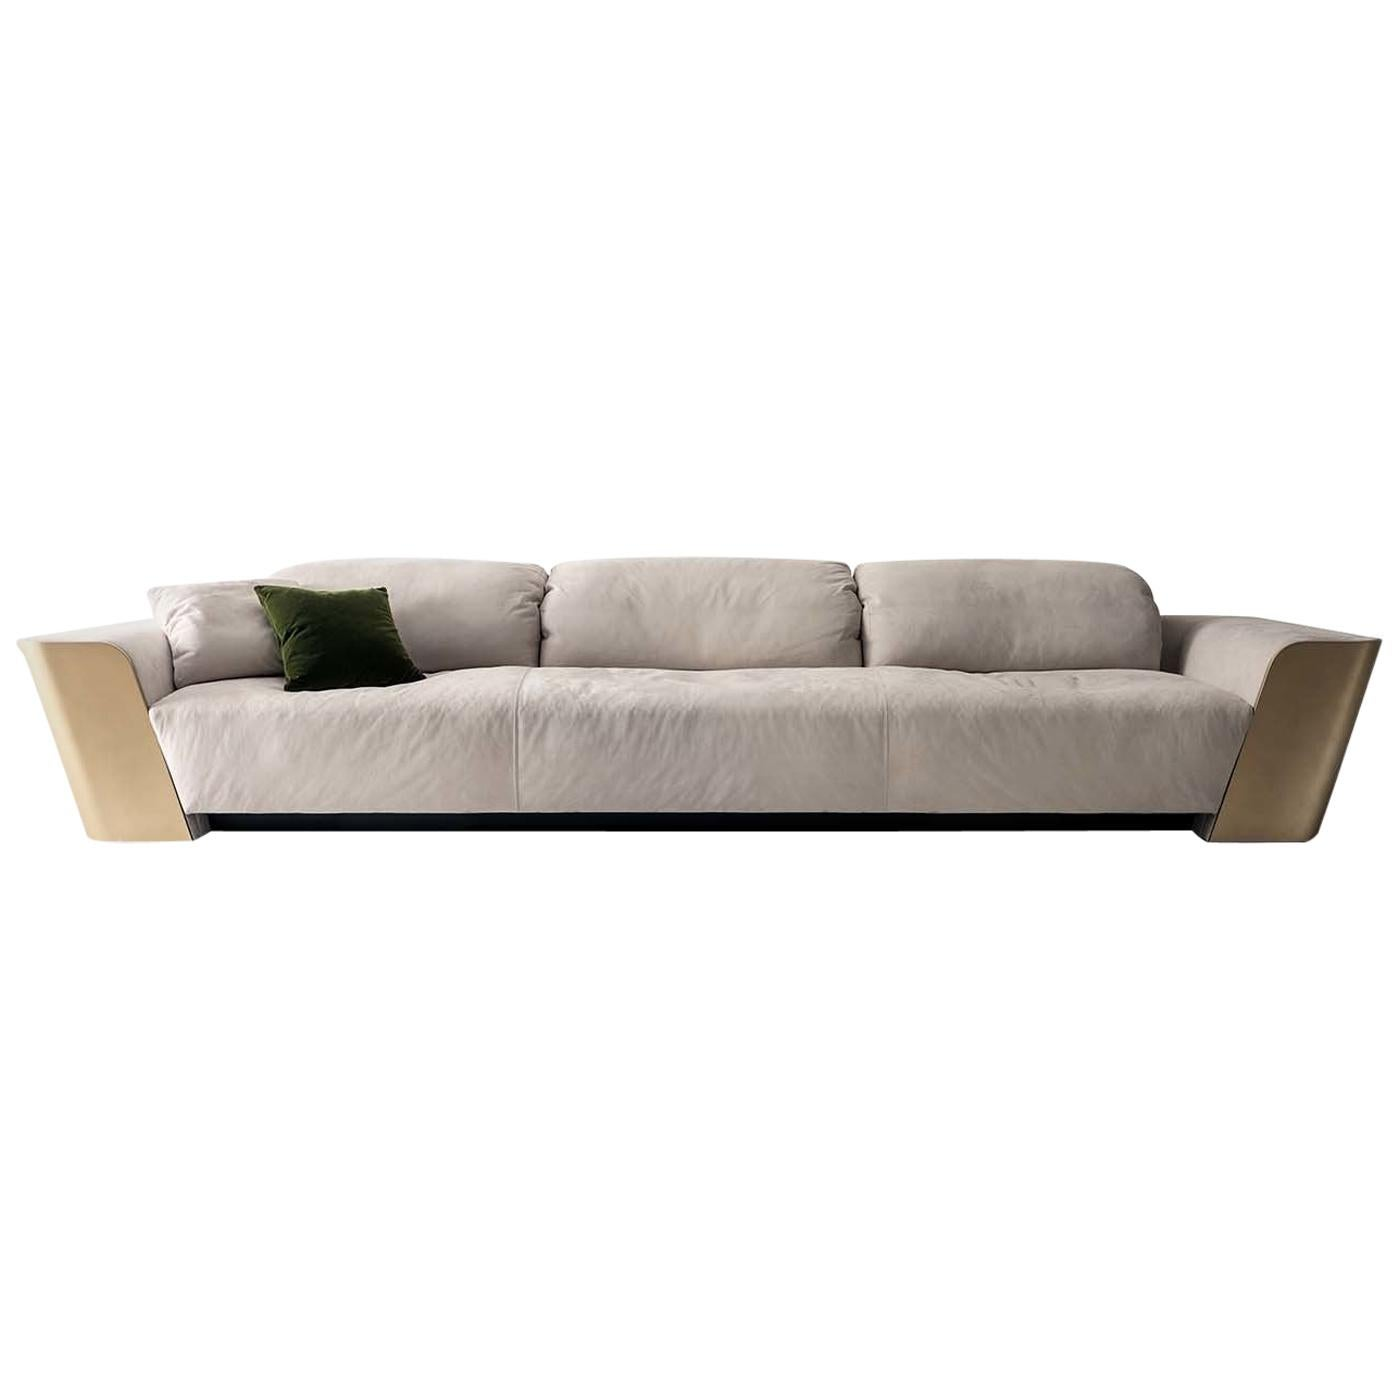 Metropol Sofa by Cesare Arosio